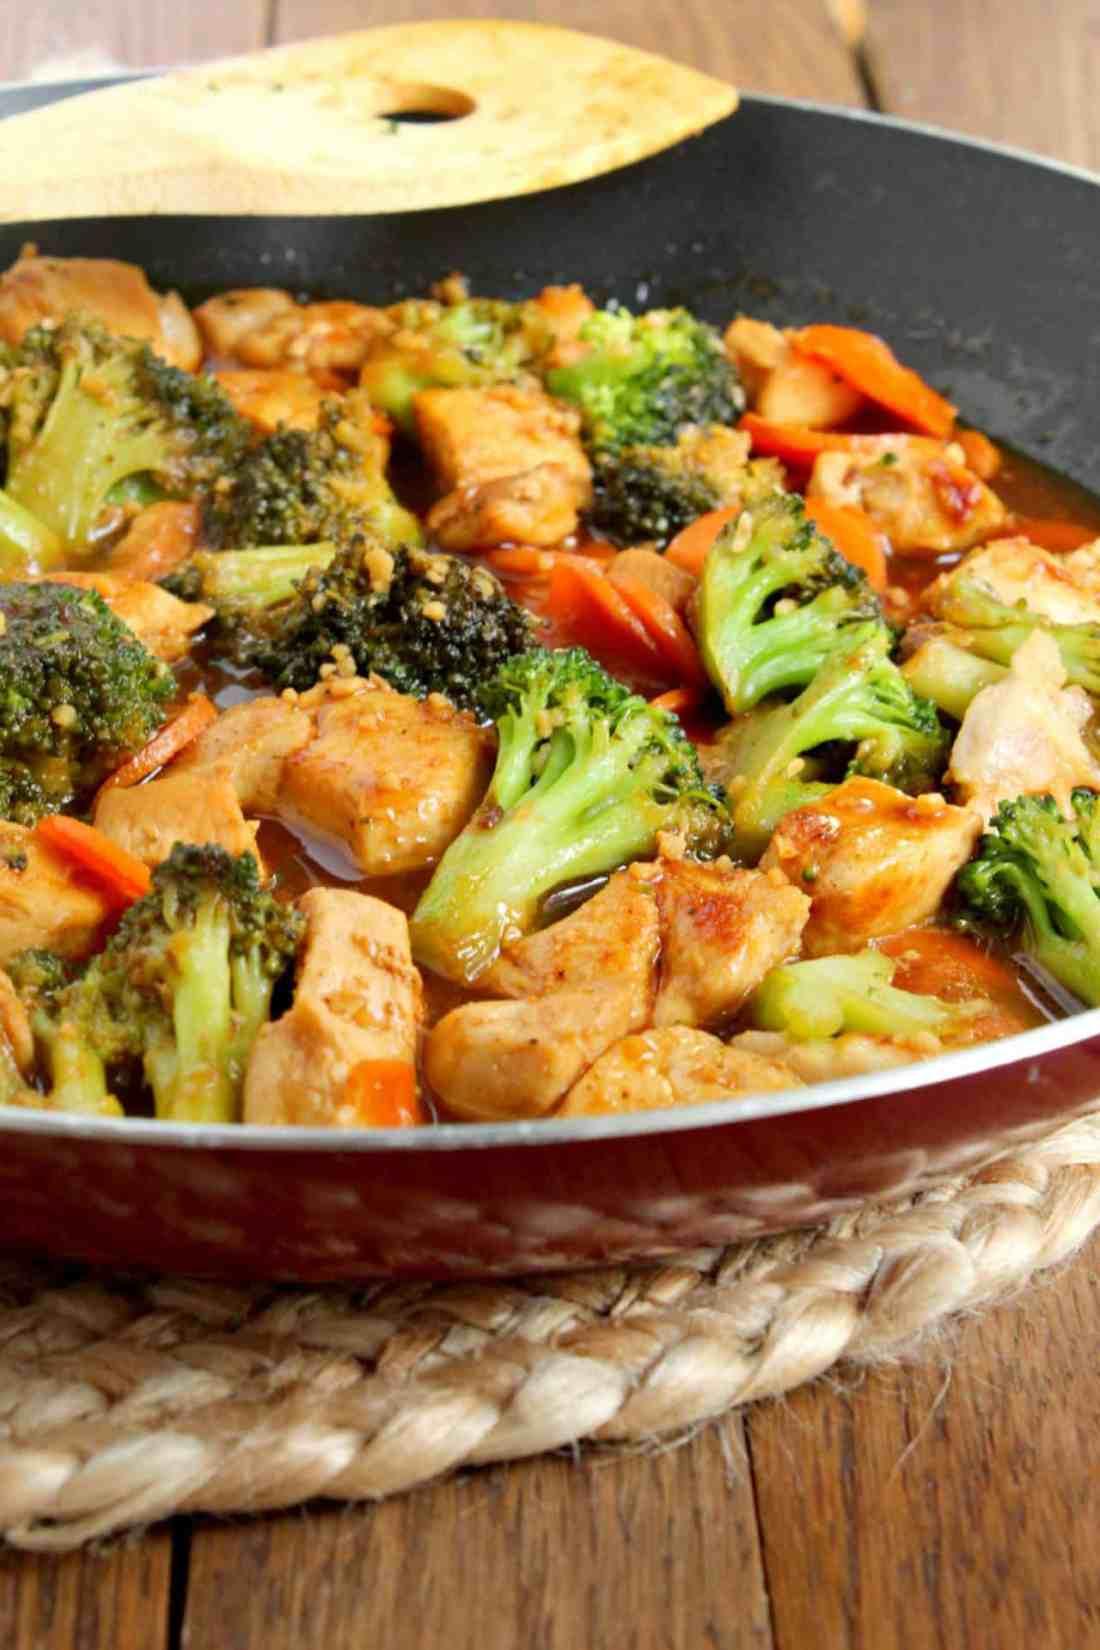 honey garlic stir fry in a red pan